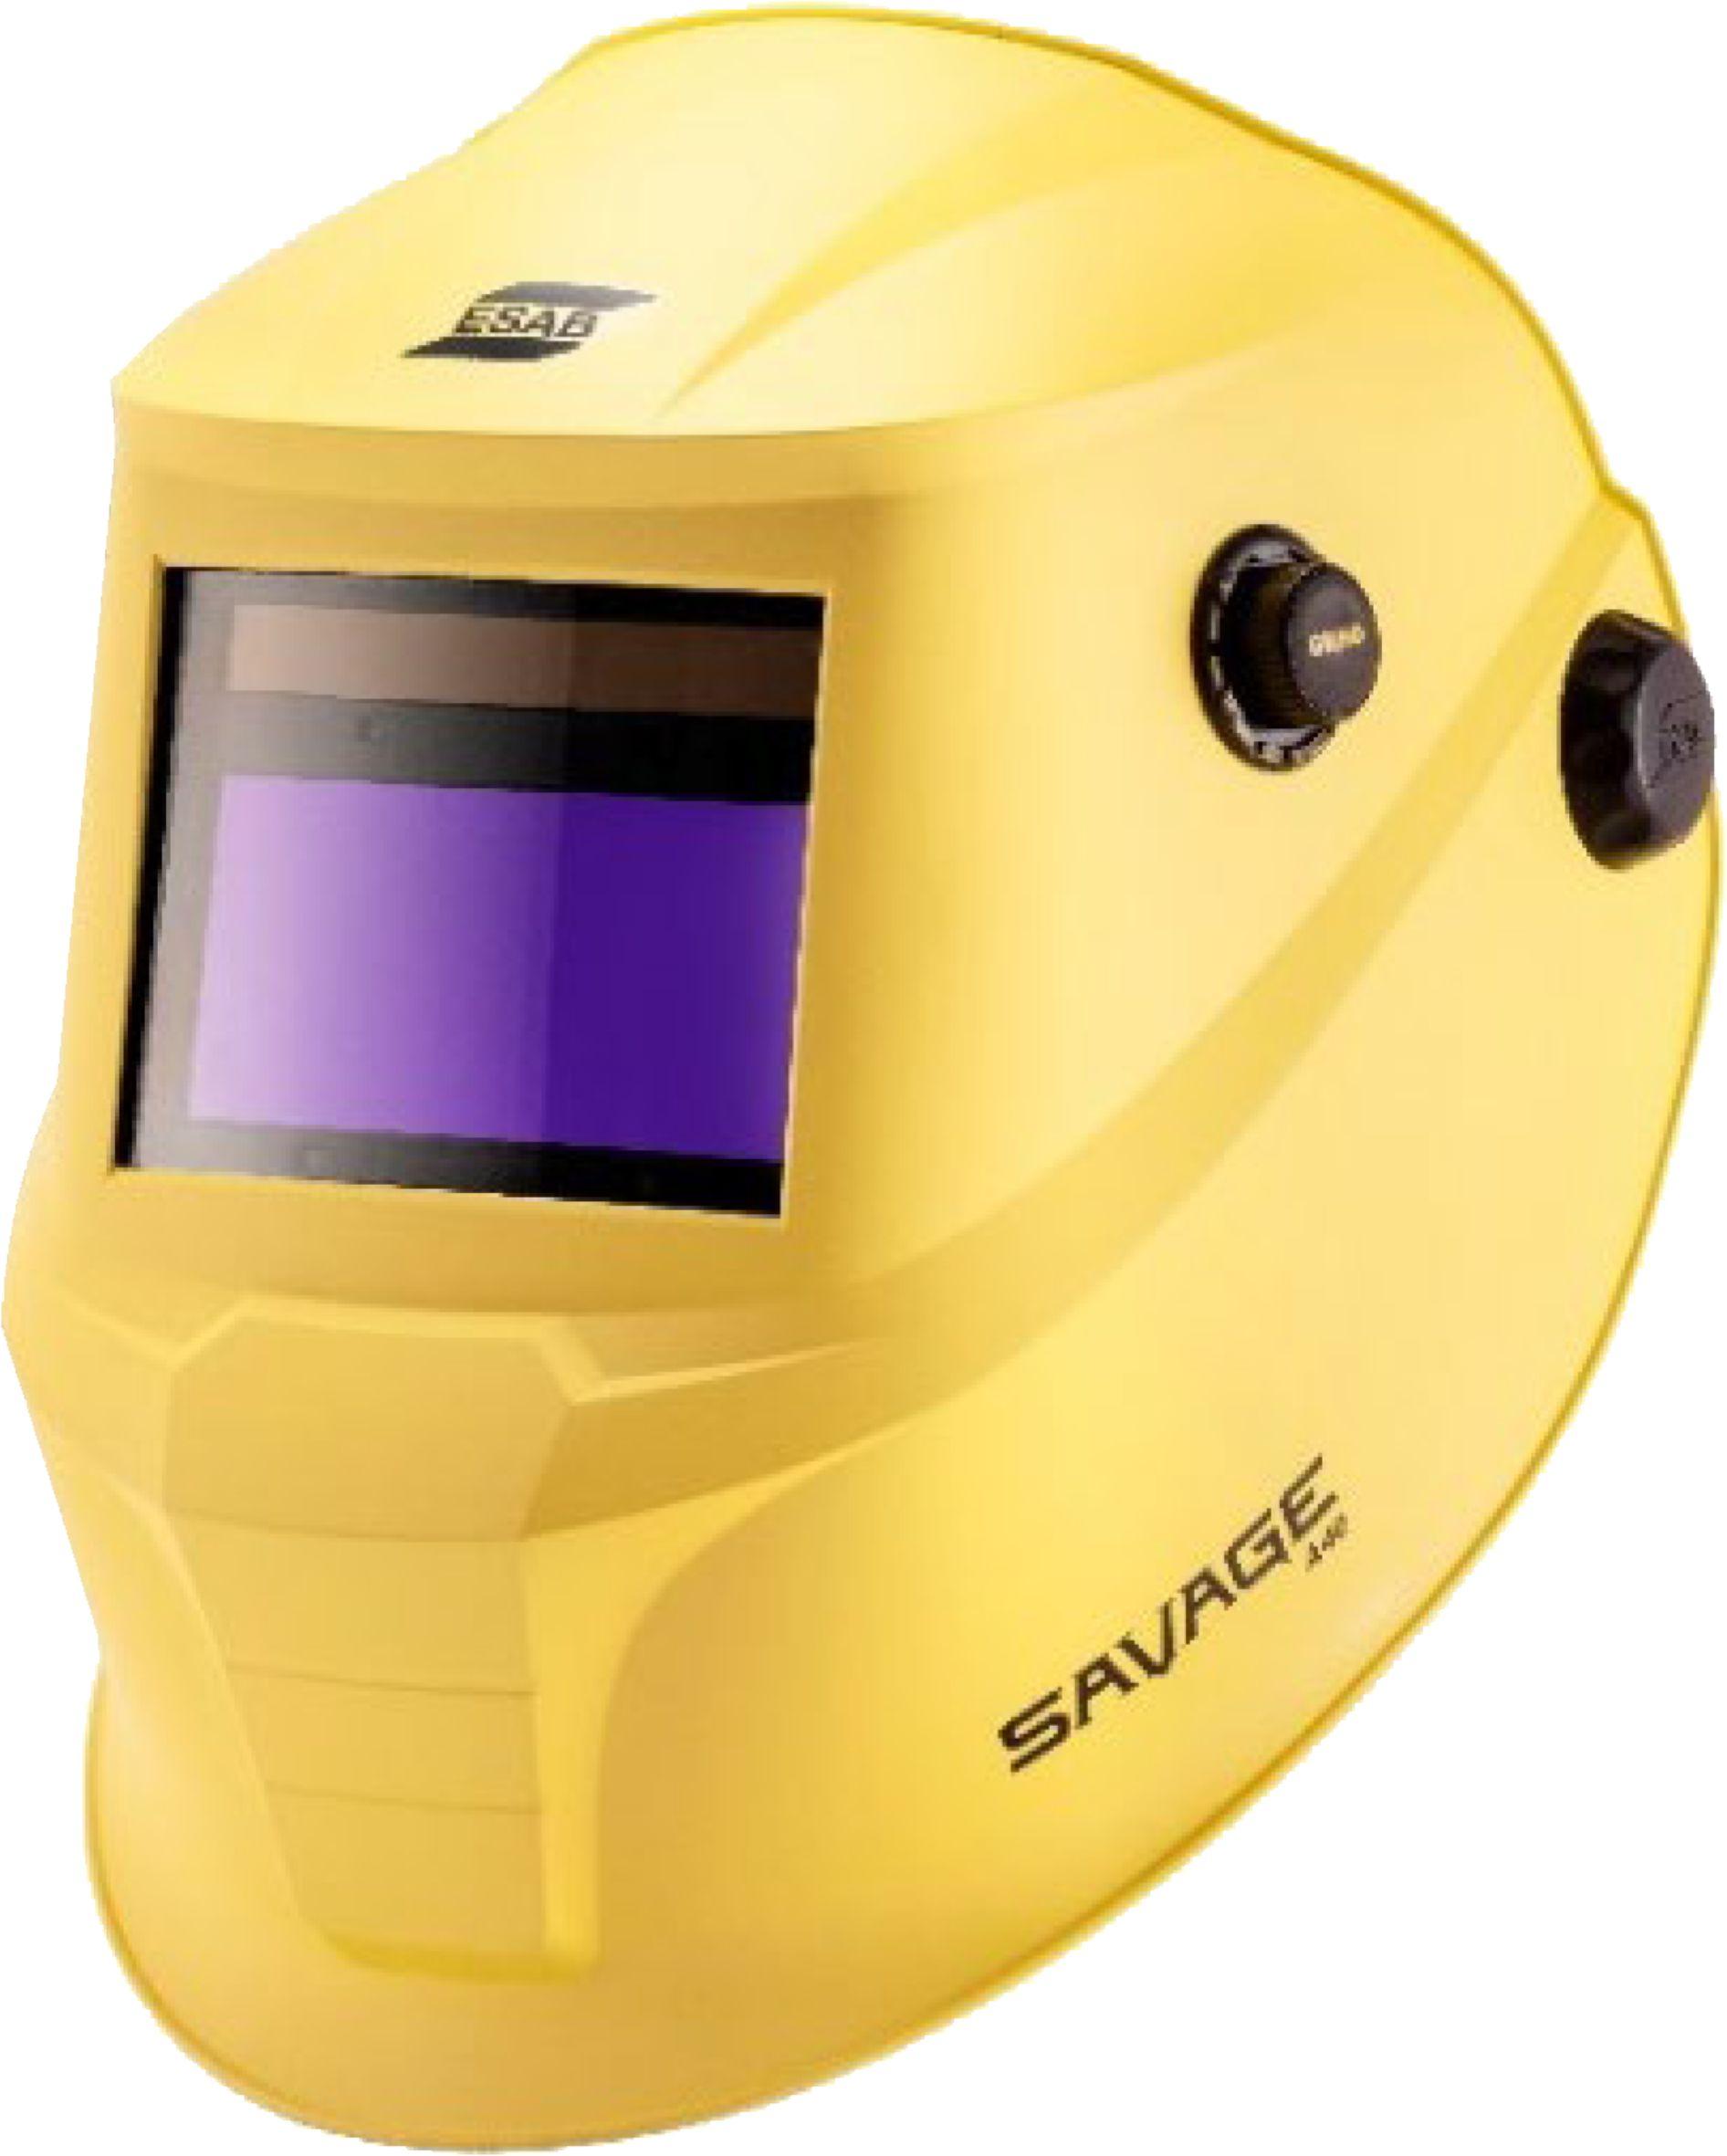 Samostmívací svářecí kukla ESAB Savage A40 0700000491 samostmívací svářecí kukla od světového výrobce ESAB